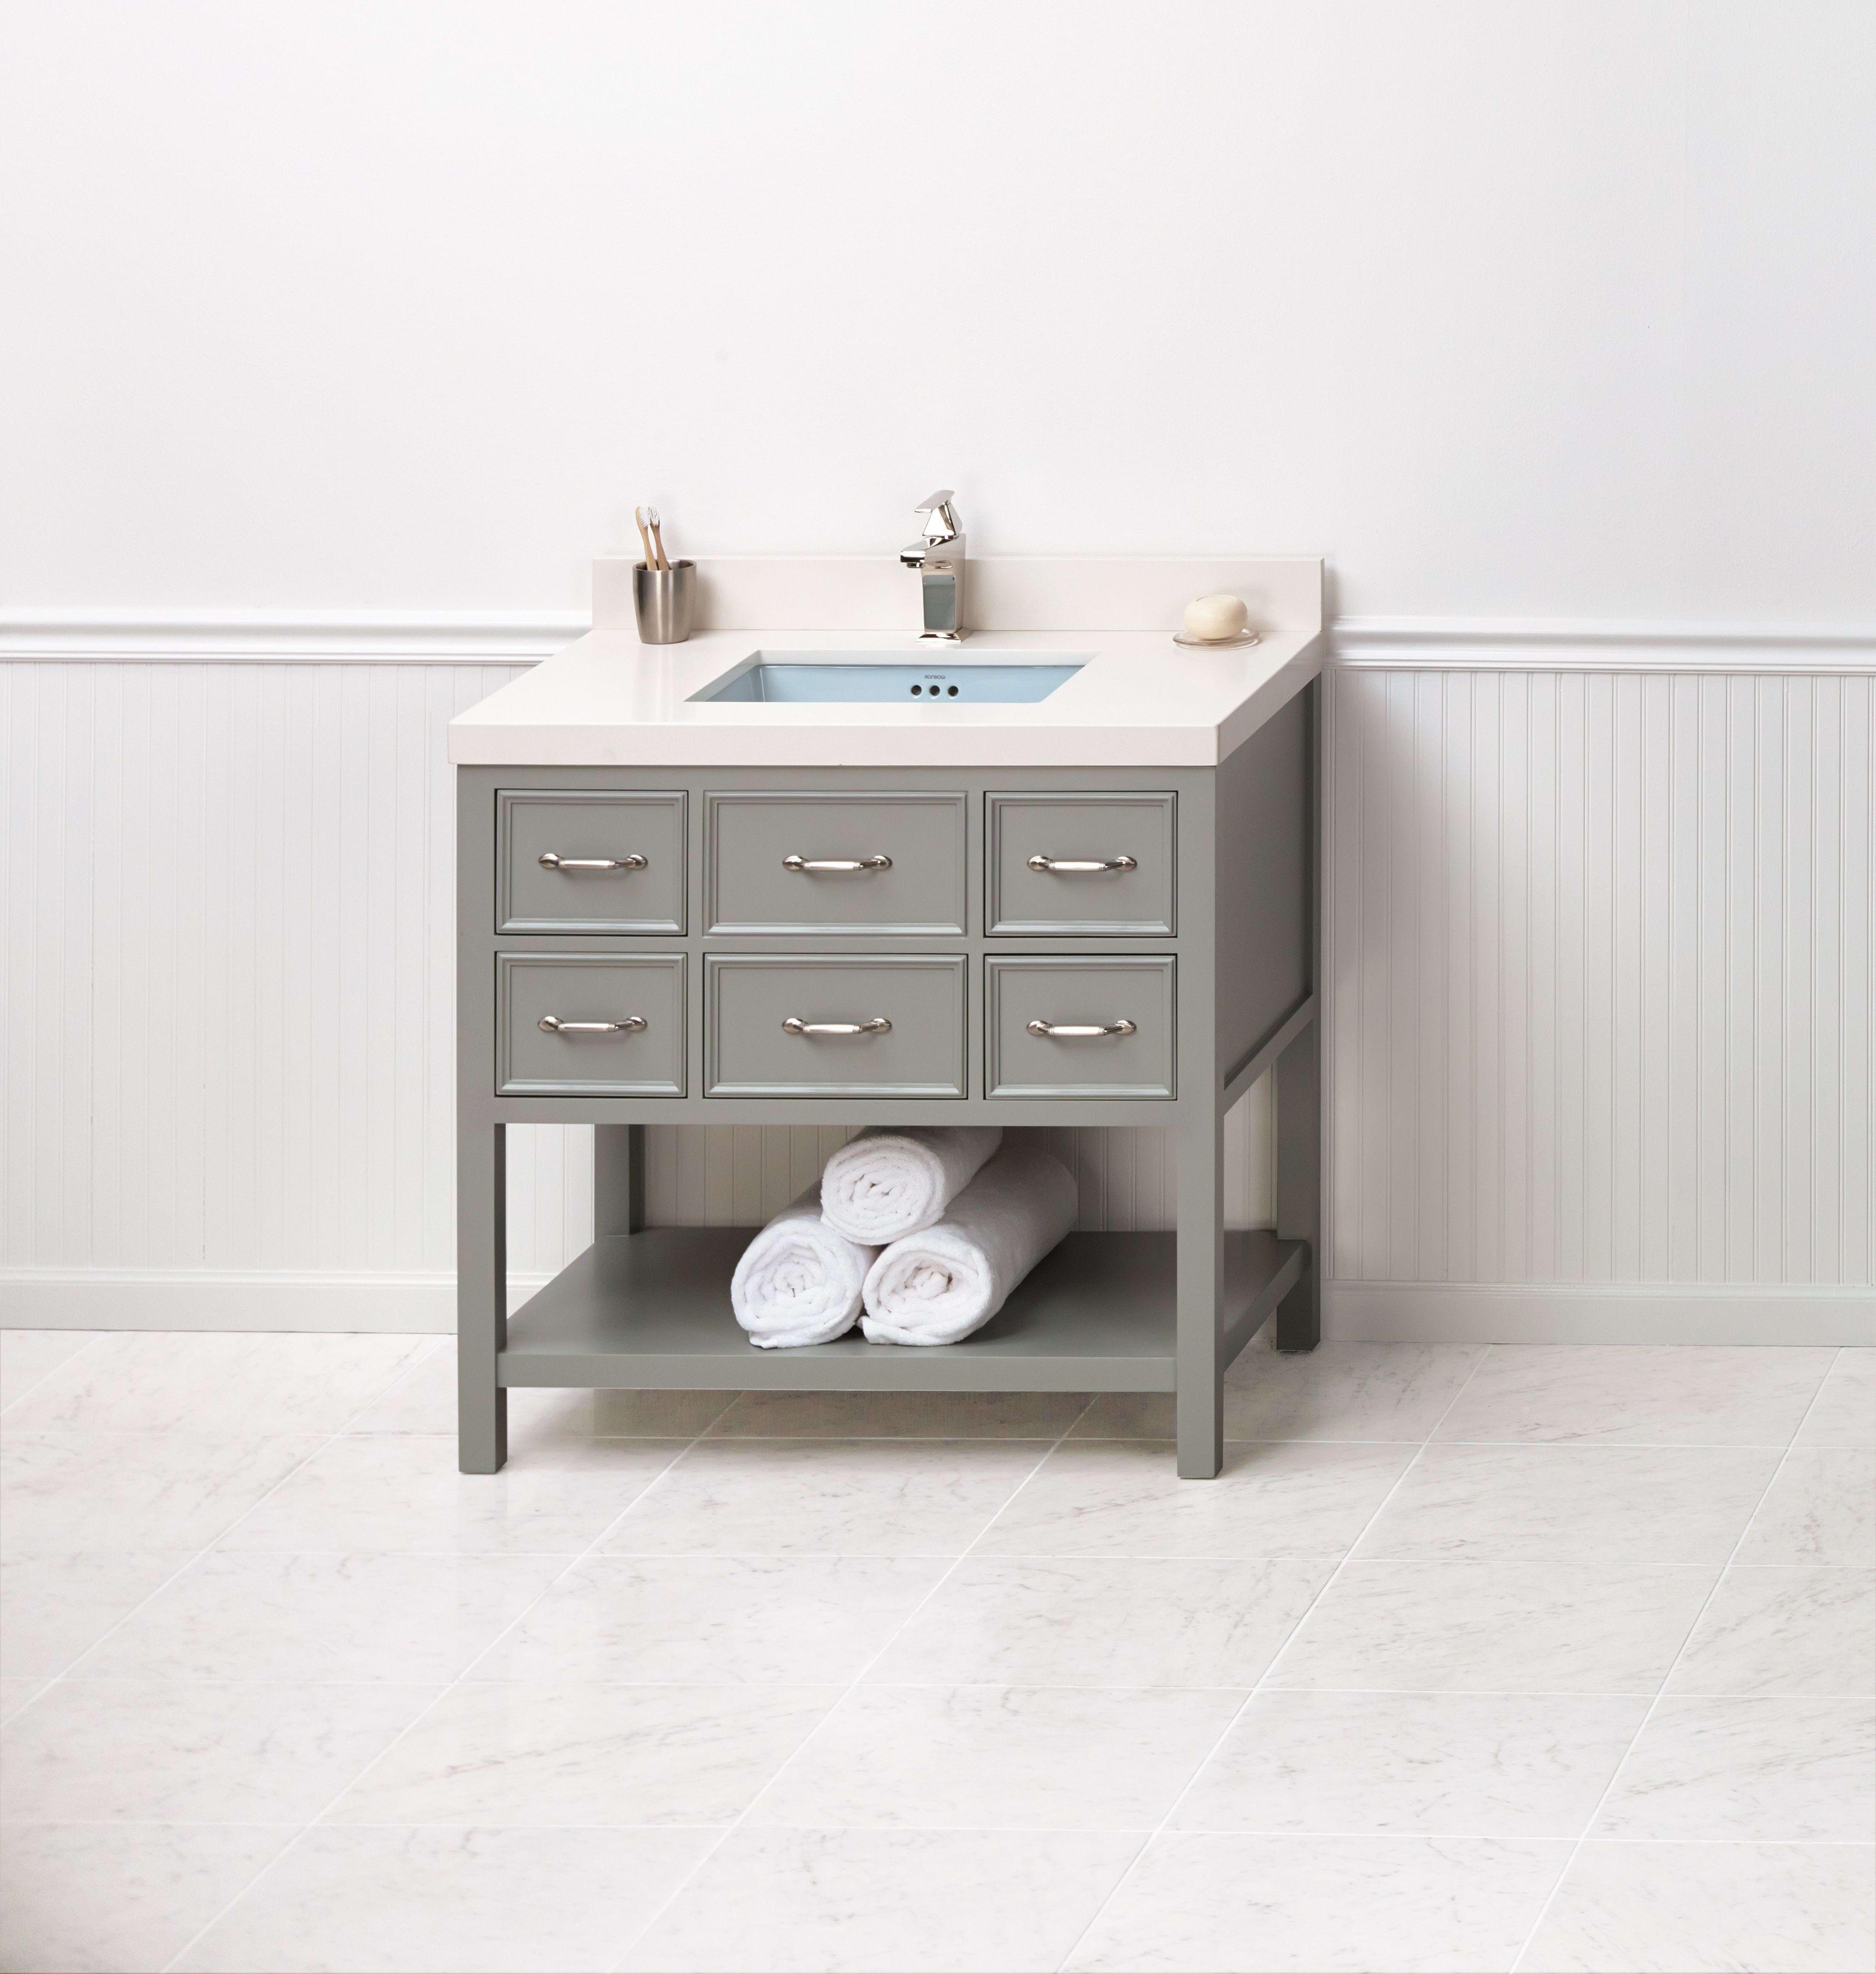 ronbow square tapered ceramic dropin bathroom sink in white  - ronbow fkit ocean gray broad black quartz top  ronbow bathroom sinks